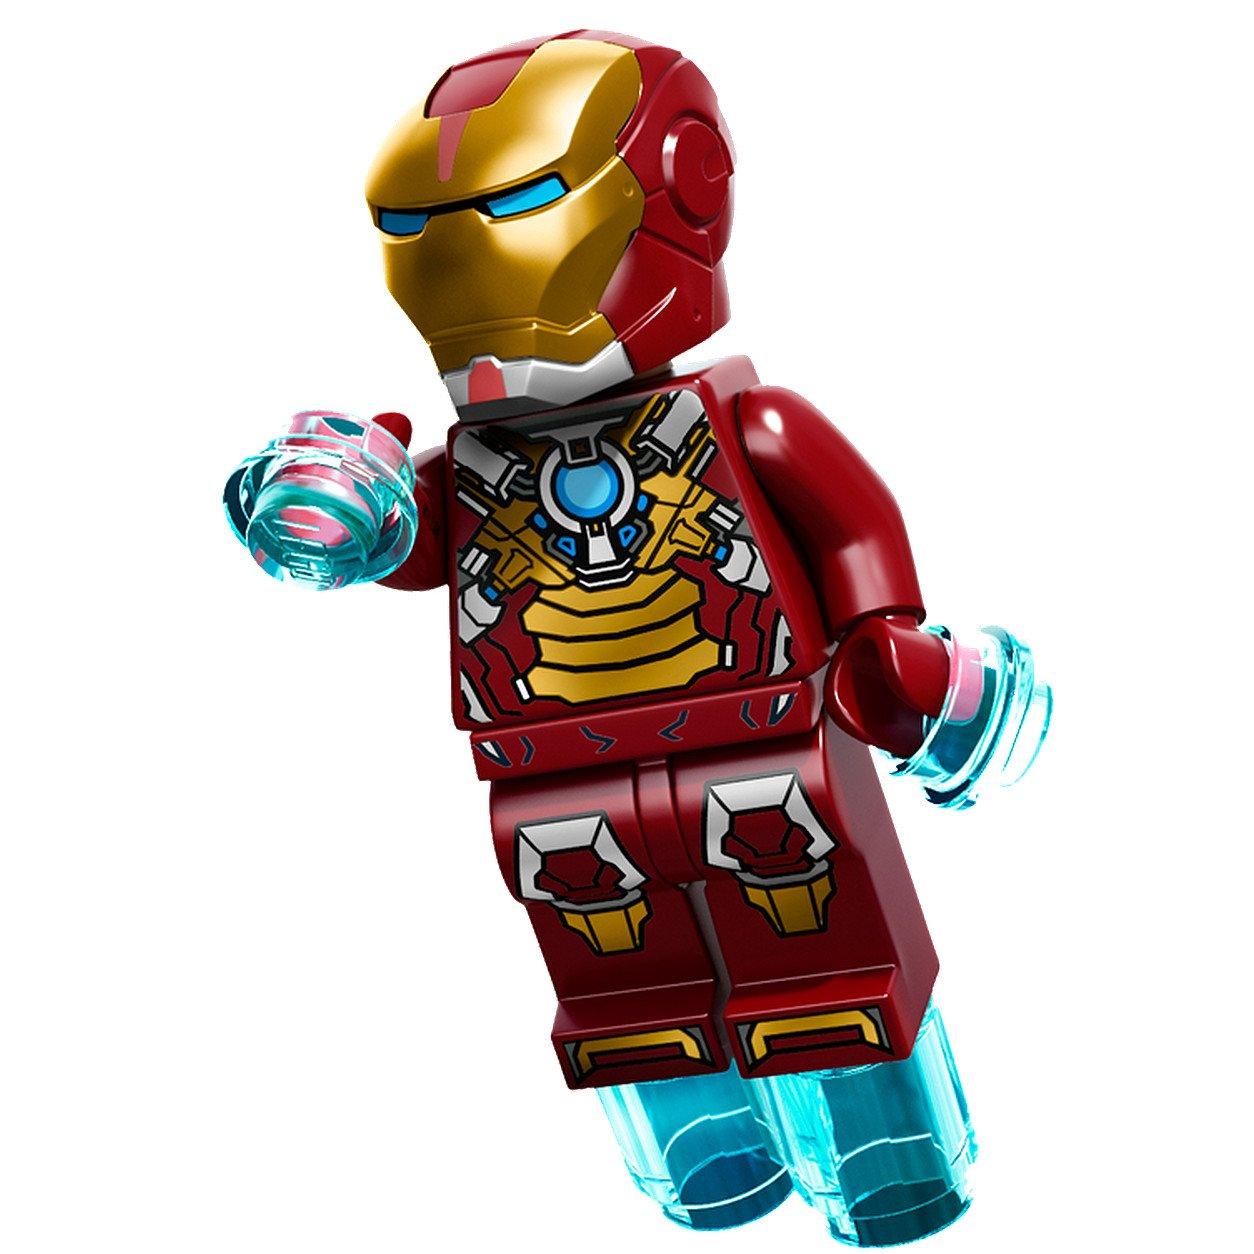 LEGO® Superheroes™ Iron Man Heart Breaker Armor Figur (2013) als Weihnachtsgeschenk